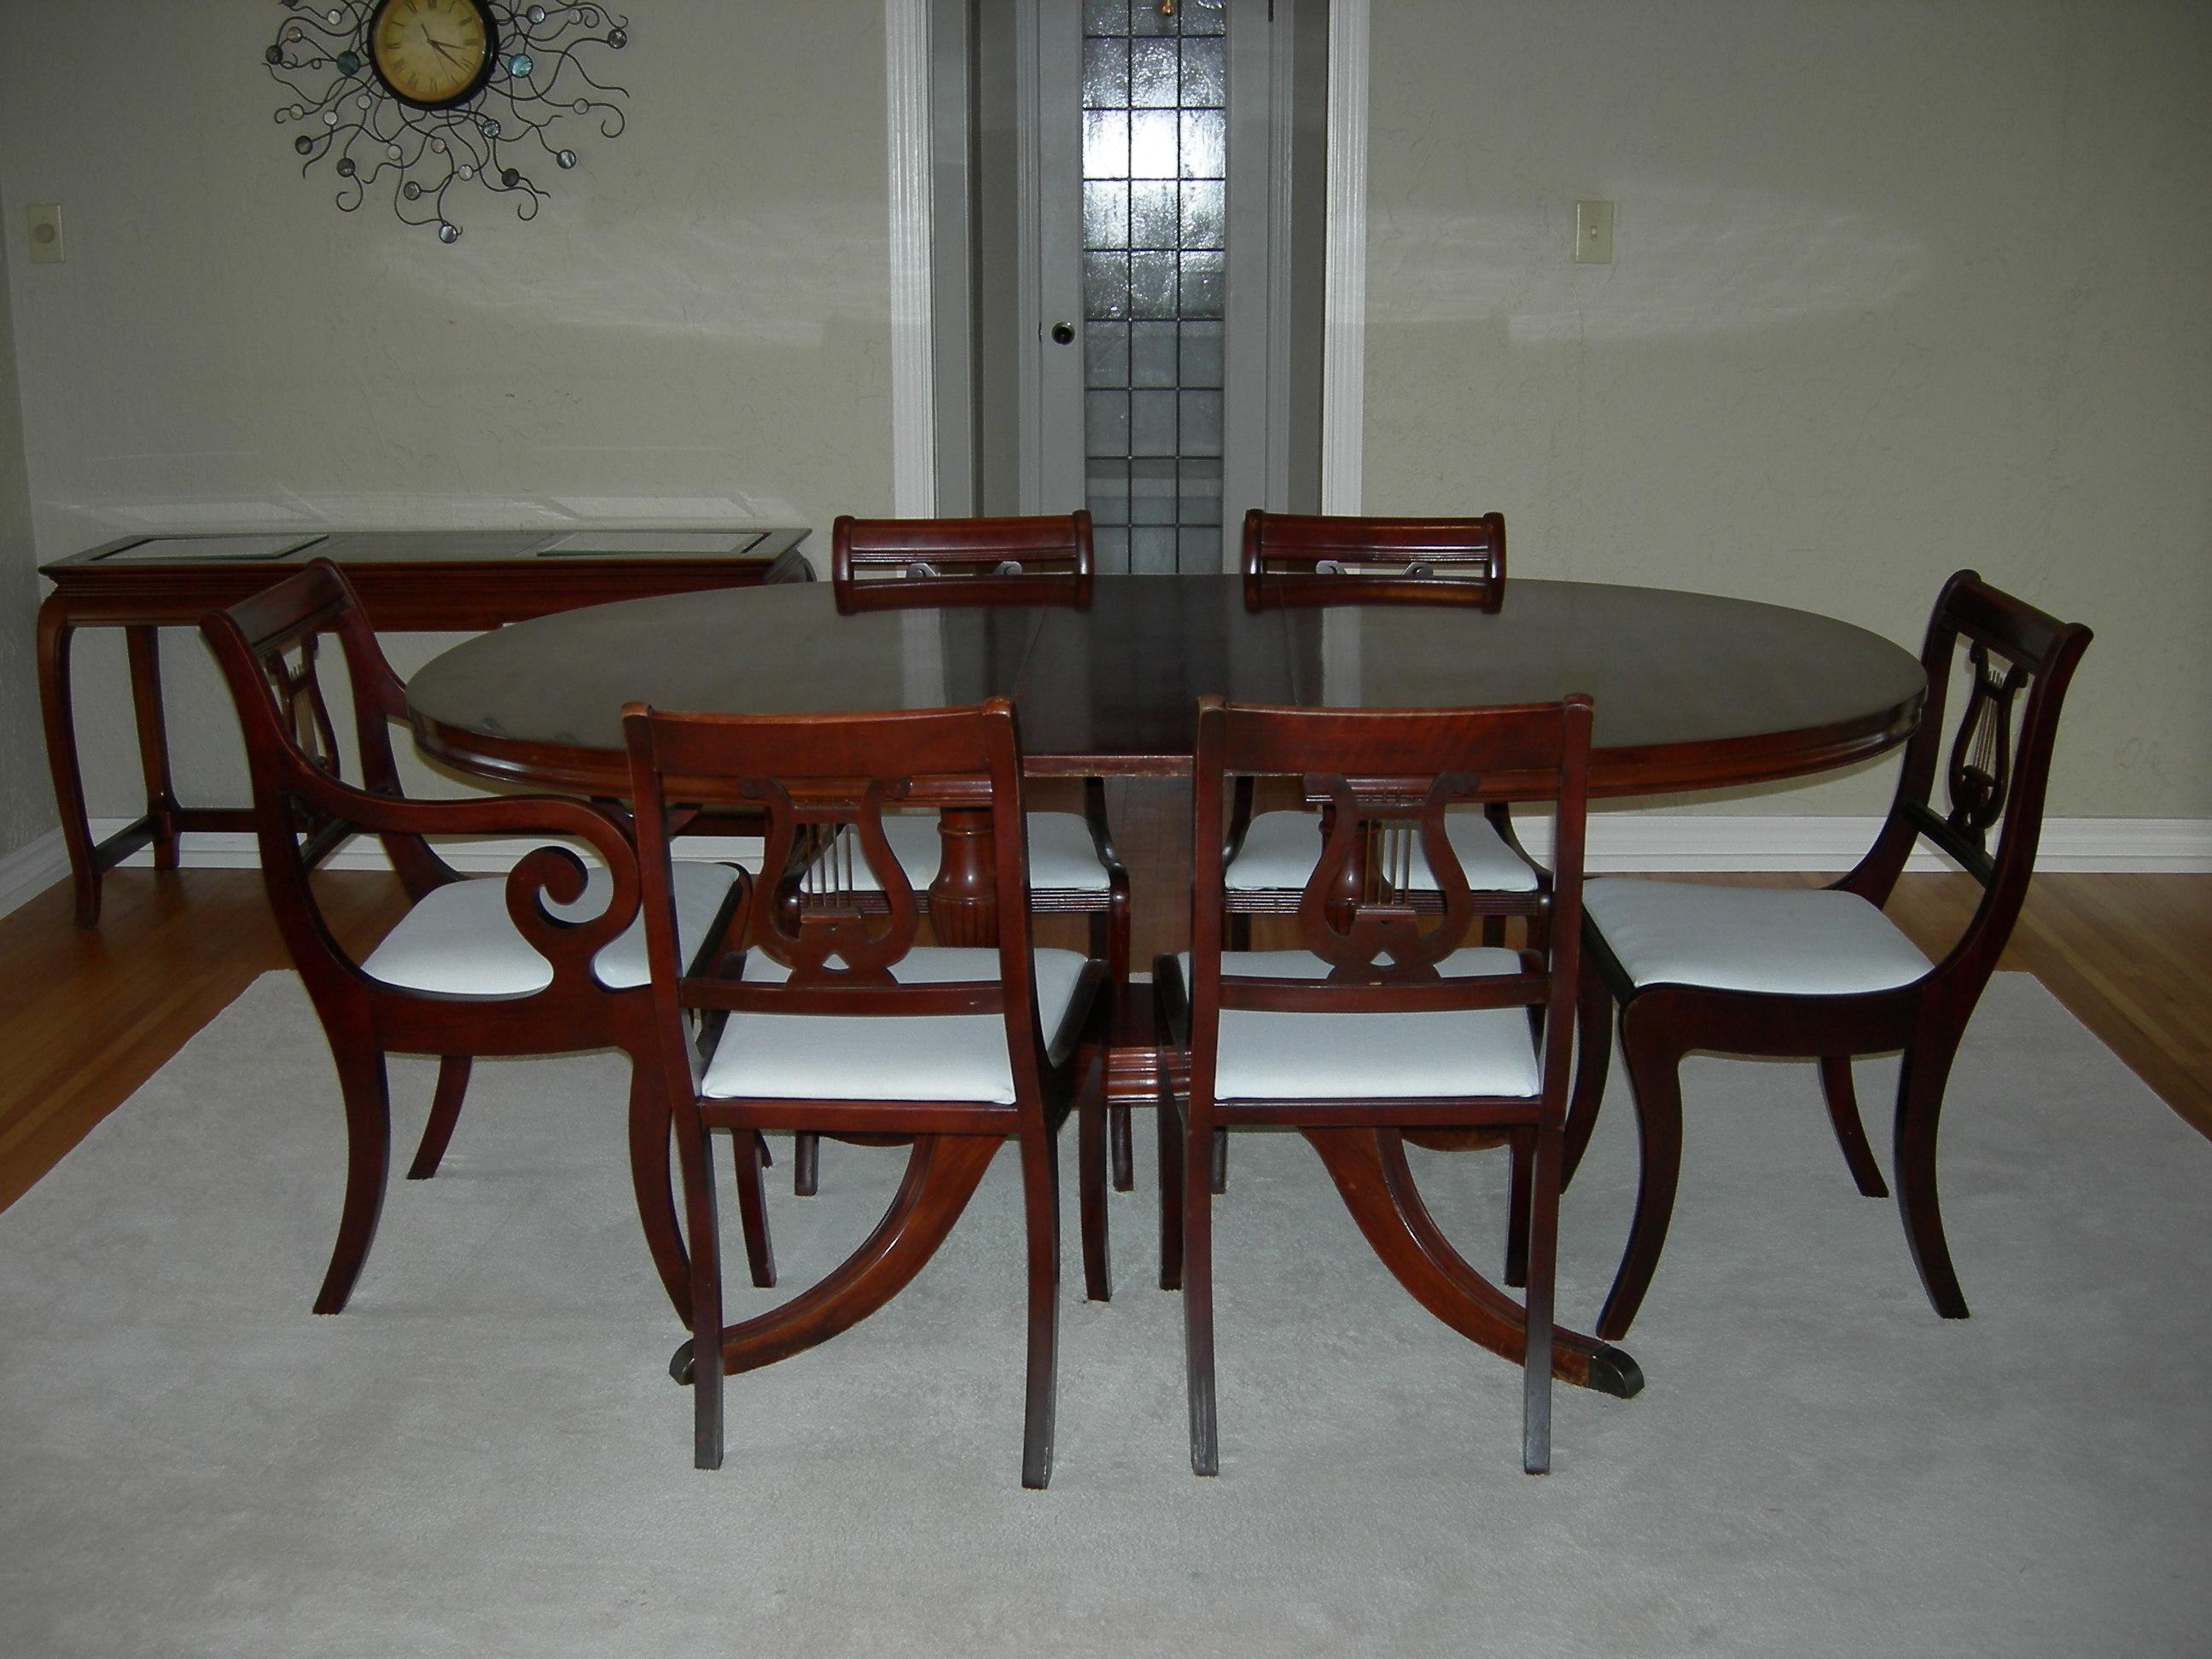 Duncan Phyfe Pedistal Mahogany Table 6 Lyre Back Chairs